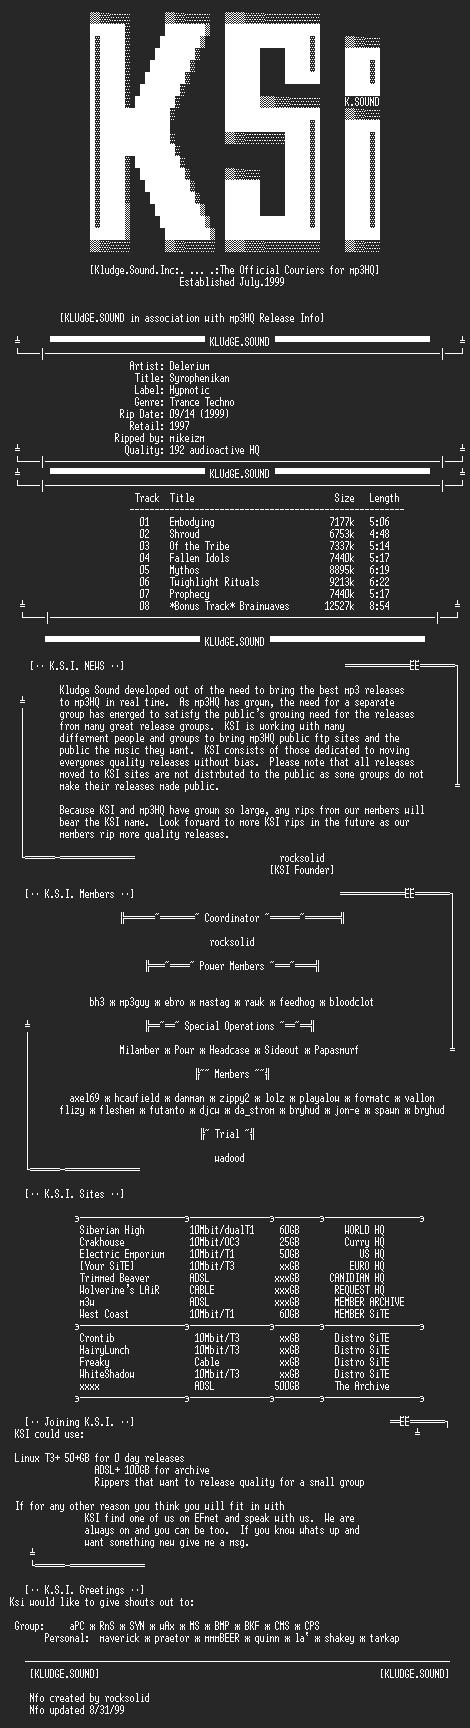 NFO file for Delerium-Syrophenikan-1997-KSi